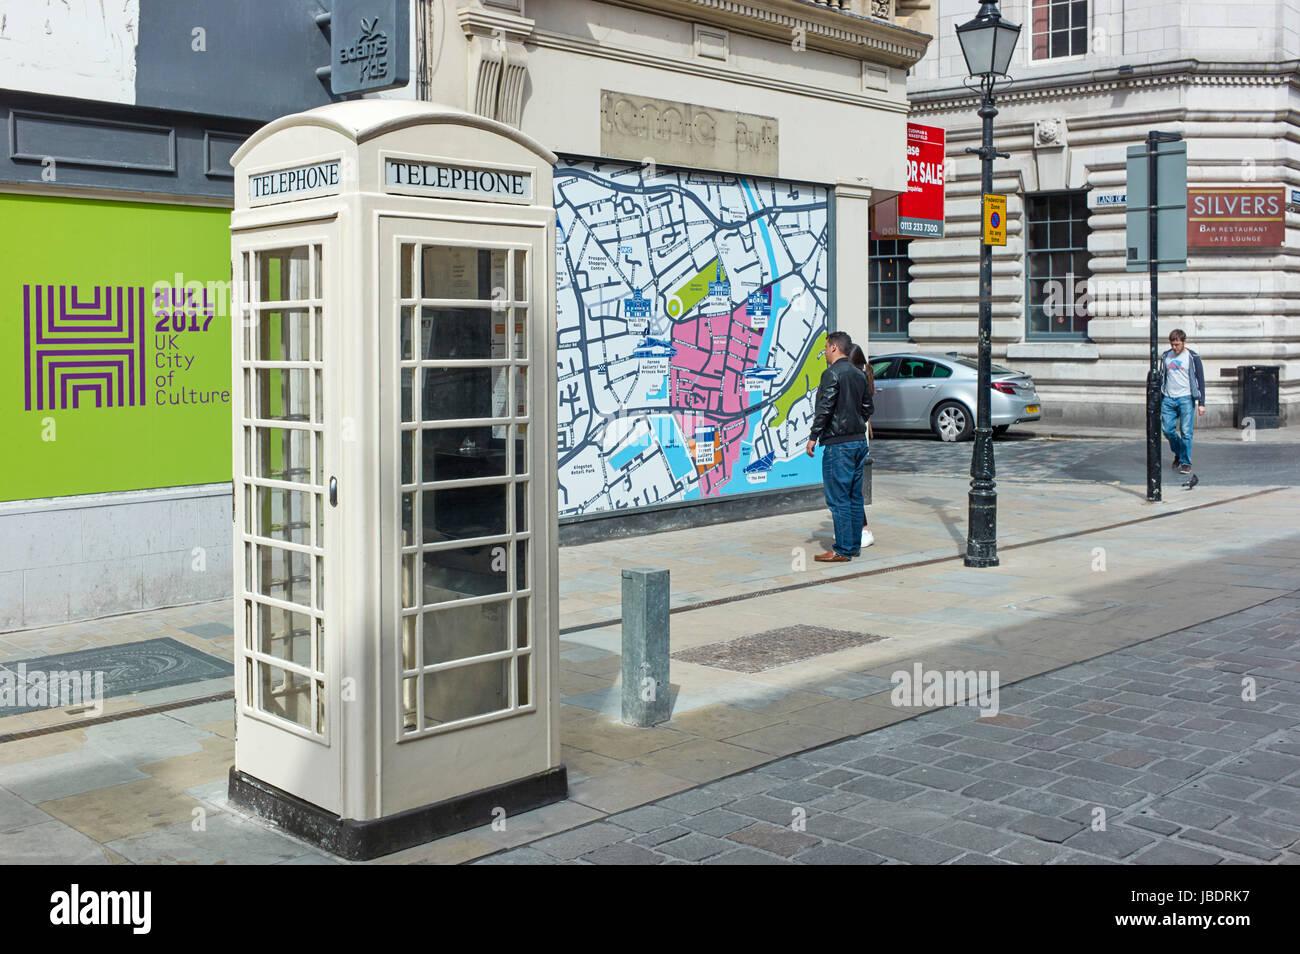 Kingston telephone box in Whitefriargate, Hull - Stock Image